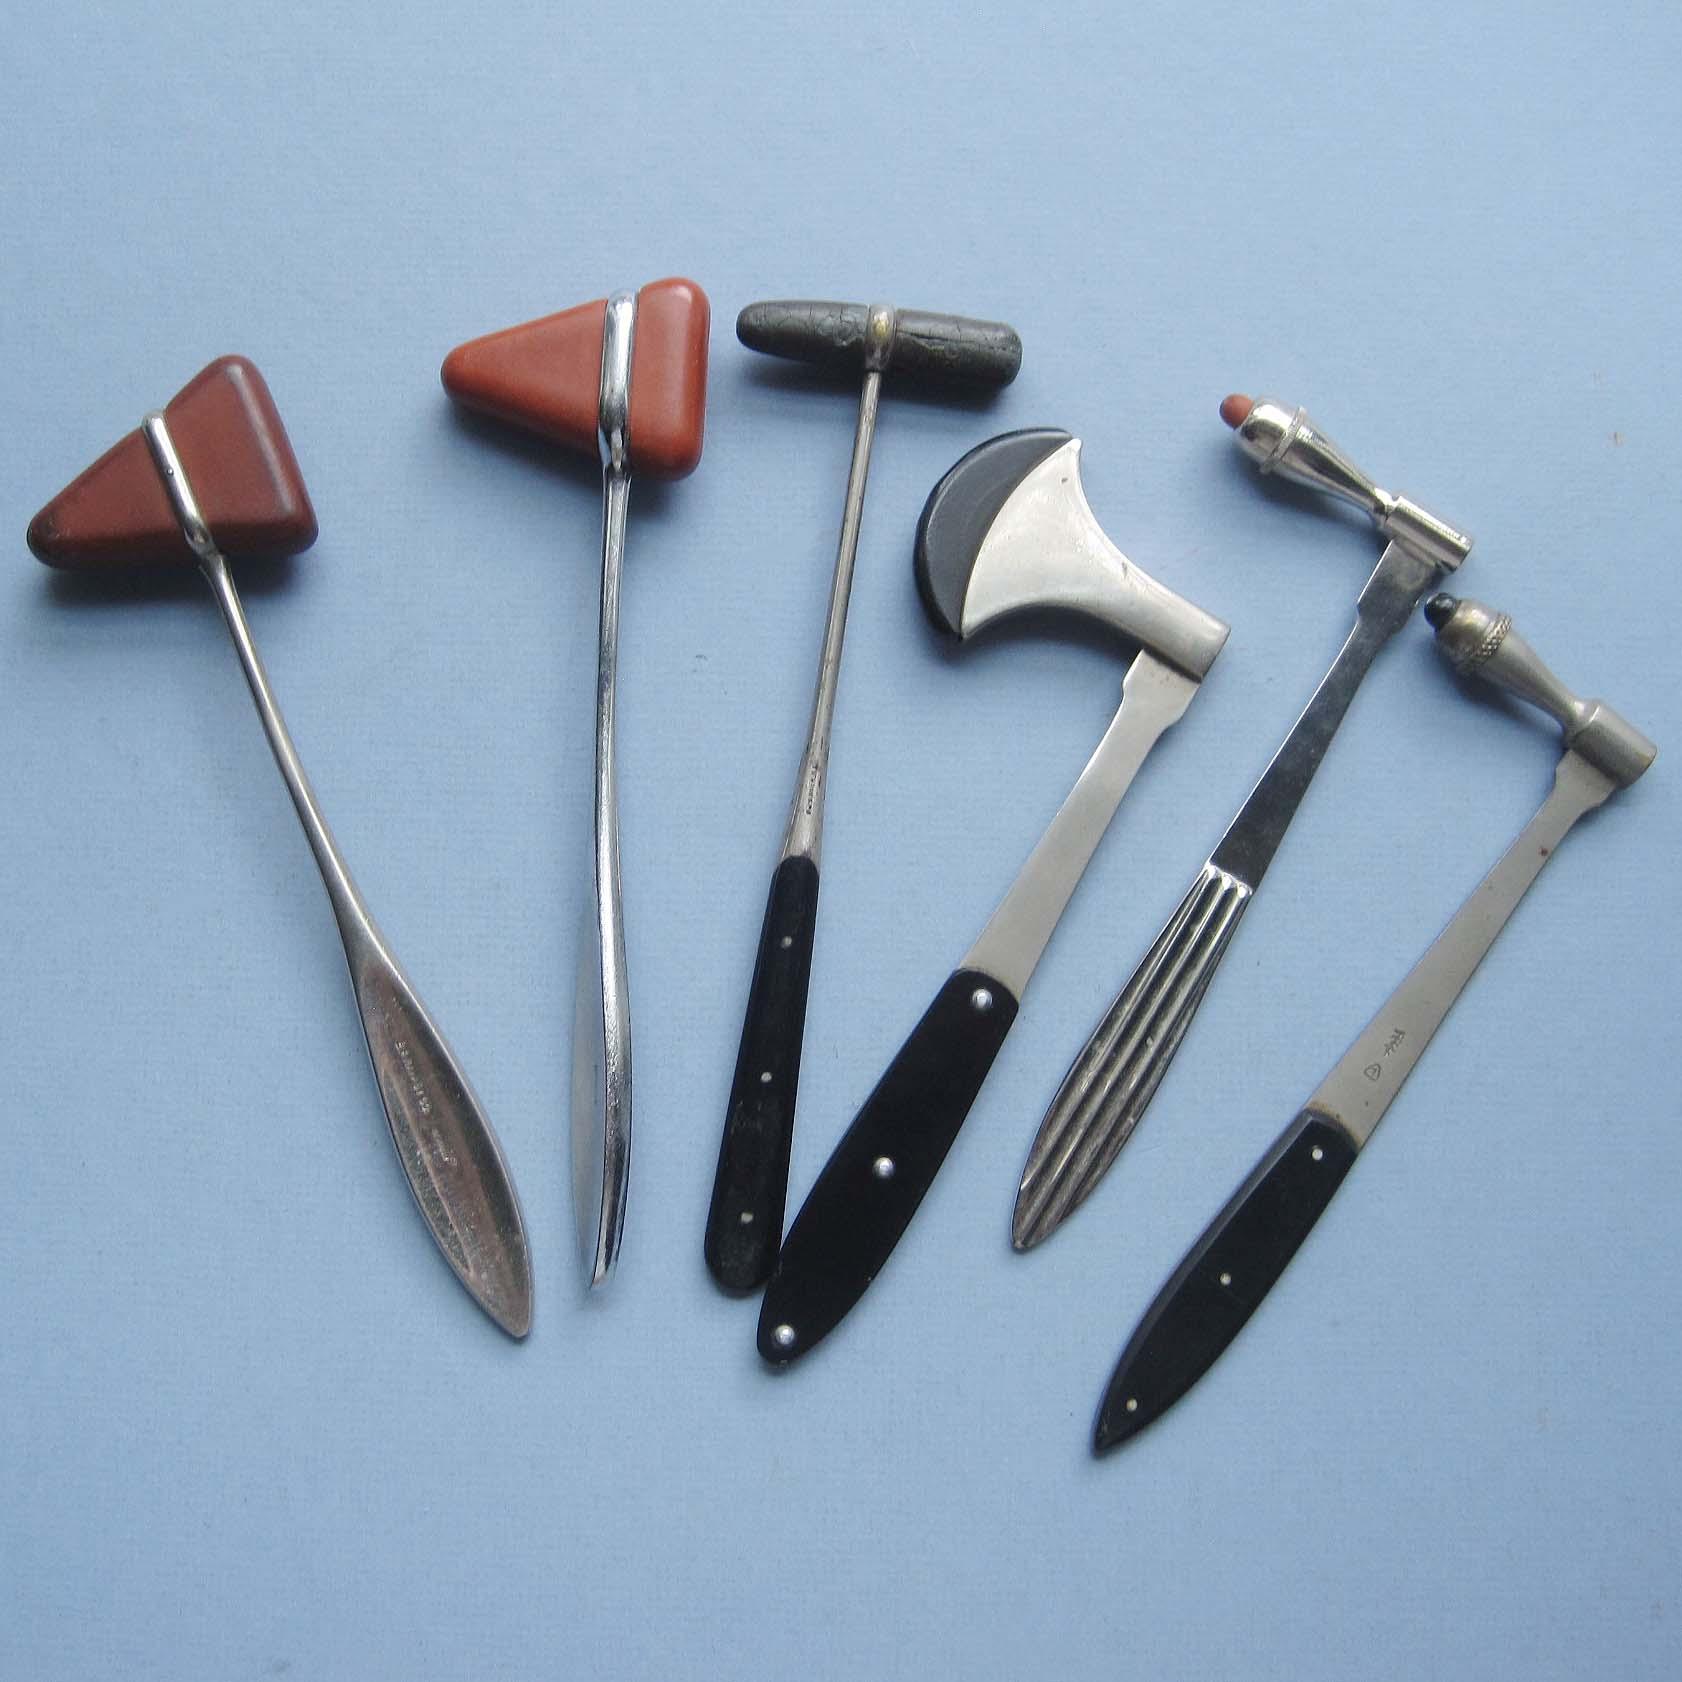 Six Percussion Hammers